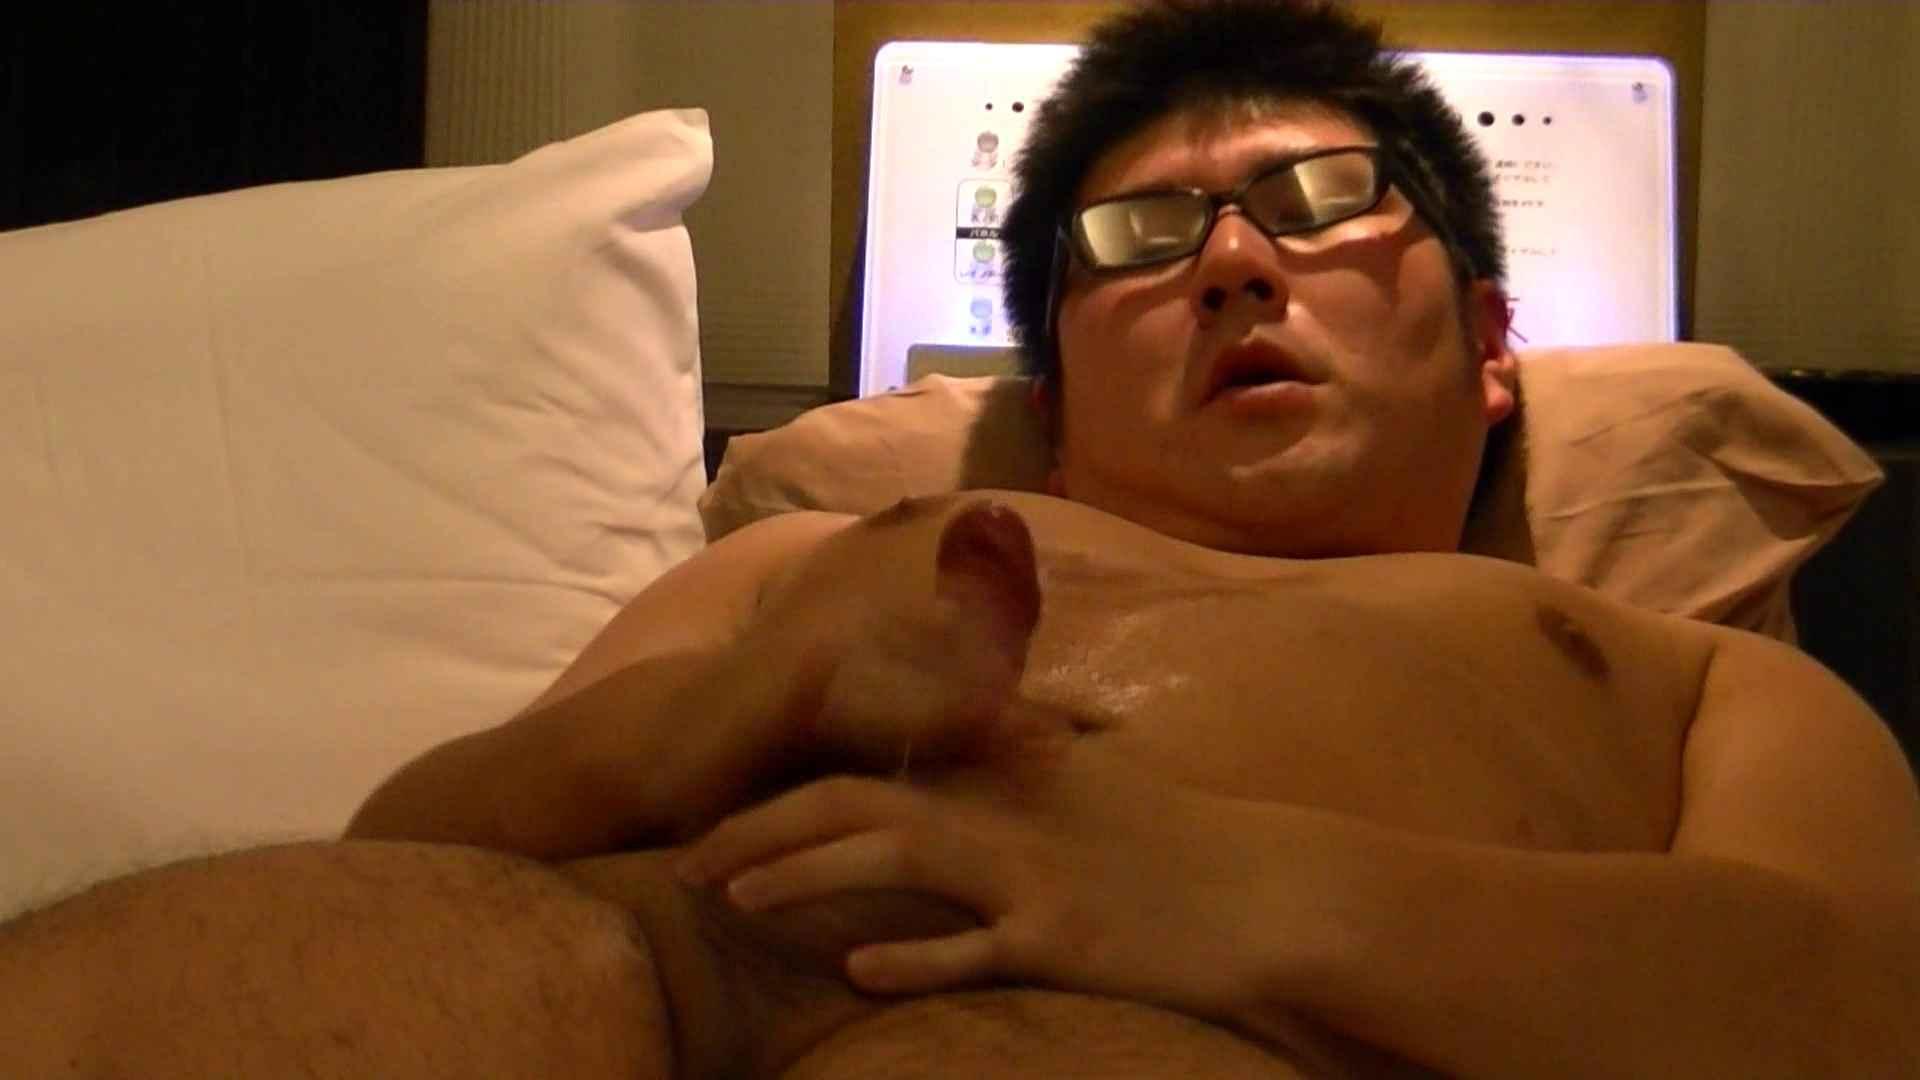 Mr.オナックスさん投稿!HD 貴方のオナニー三万円で撮影させてください。VOL.03 後編 完全無修正でお届け | オナニー特集  83pic 73